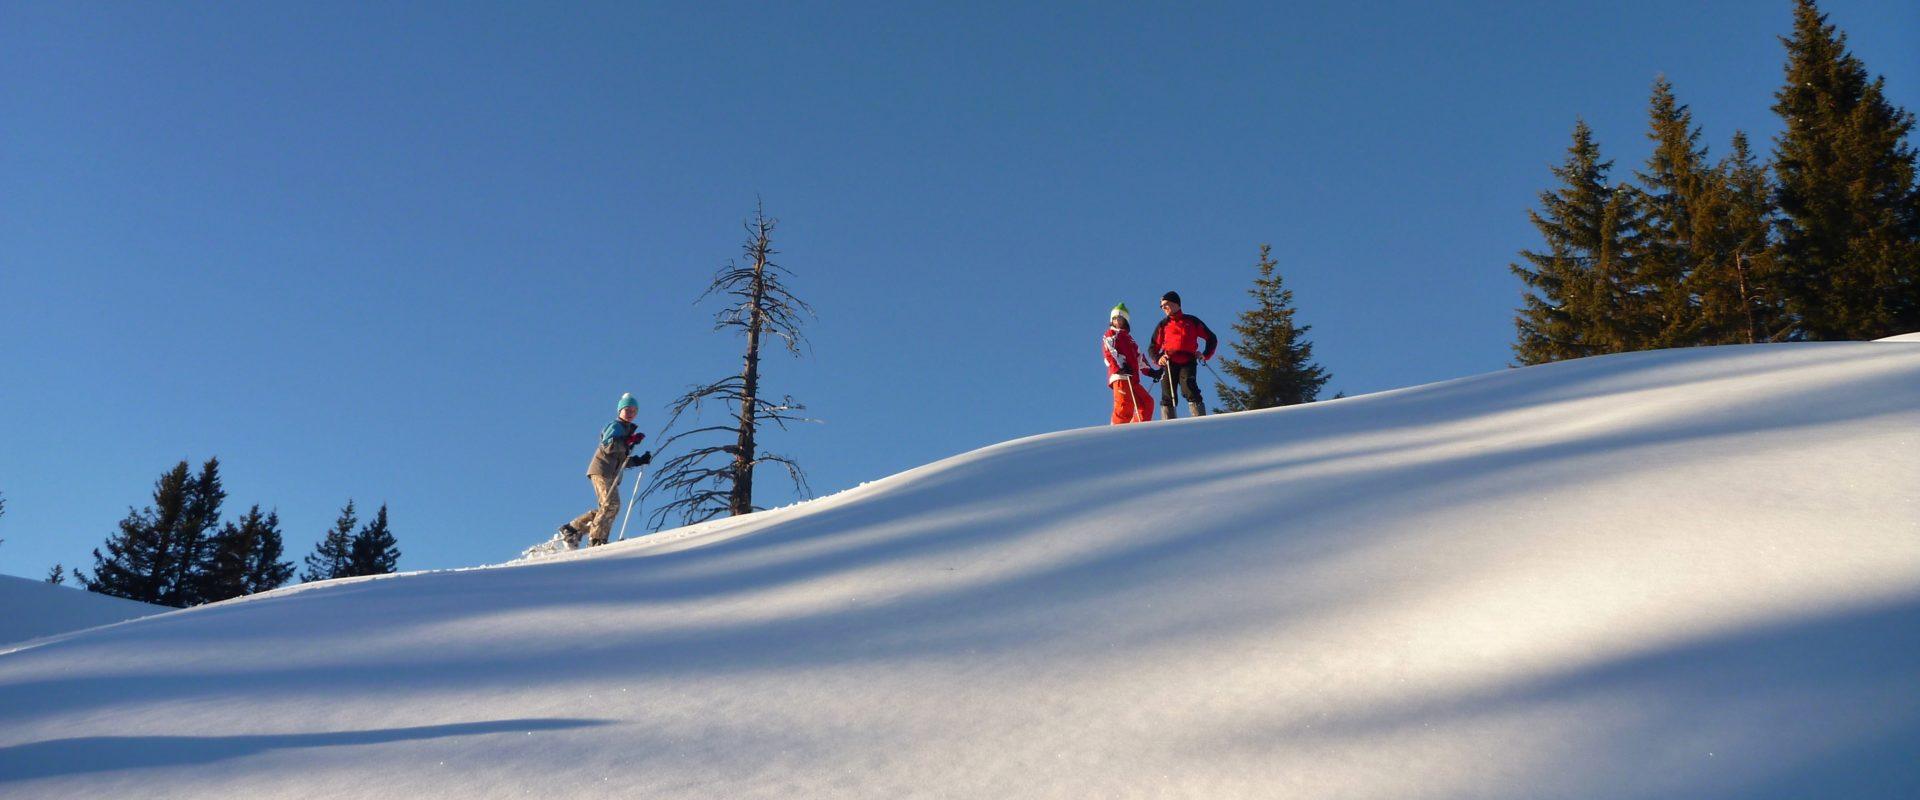 Panorama Schneeschuhtour mit Moses_Markus Moosbrugger (2)